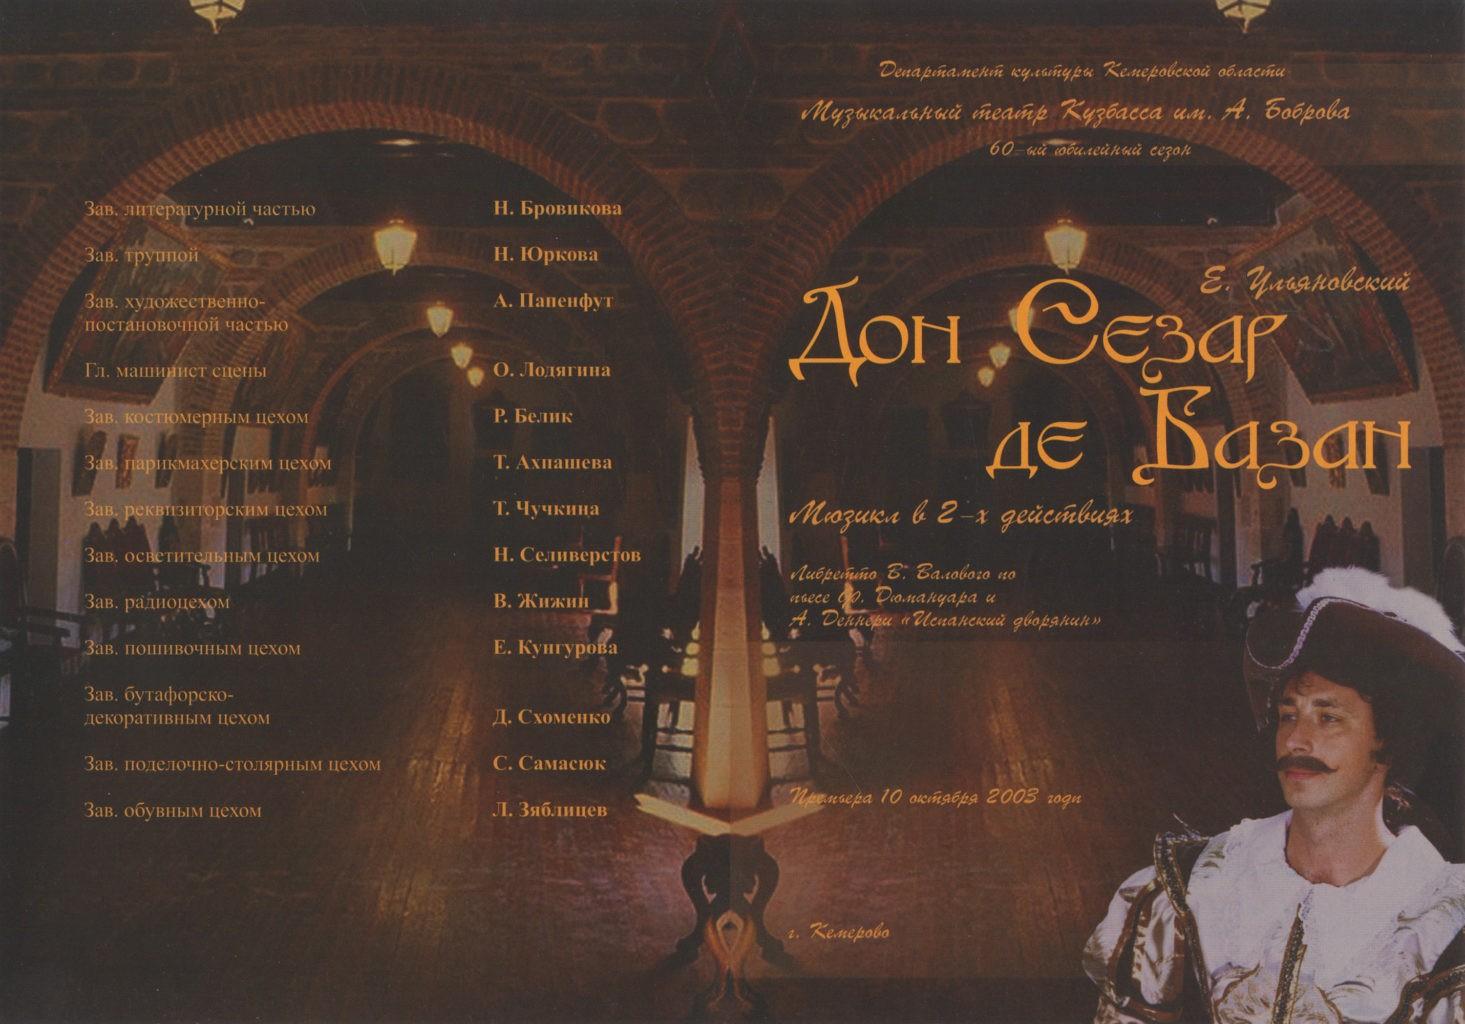 Е. Ульяновский. Дон Сезар де Базан. Мюзикл, 2003 г.: театральная программа